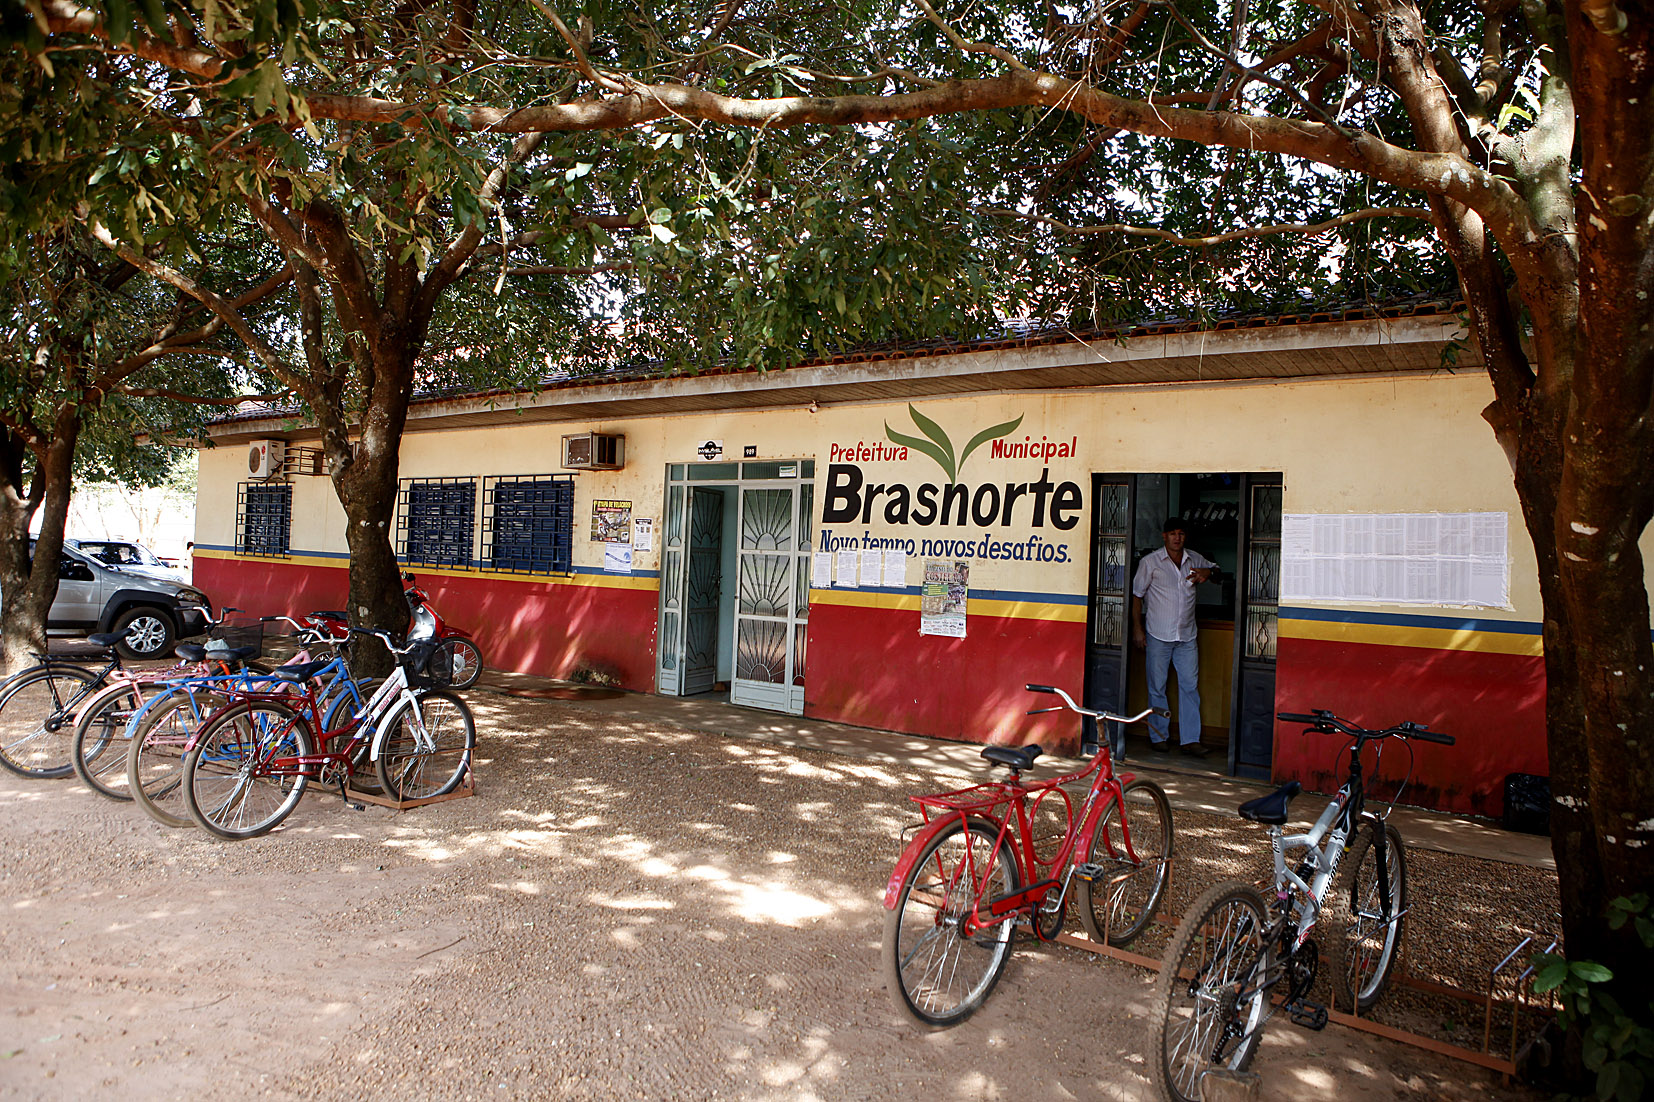 Brasnorte - Prefeitura